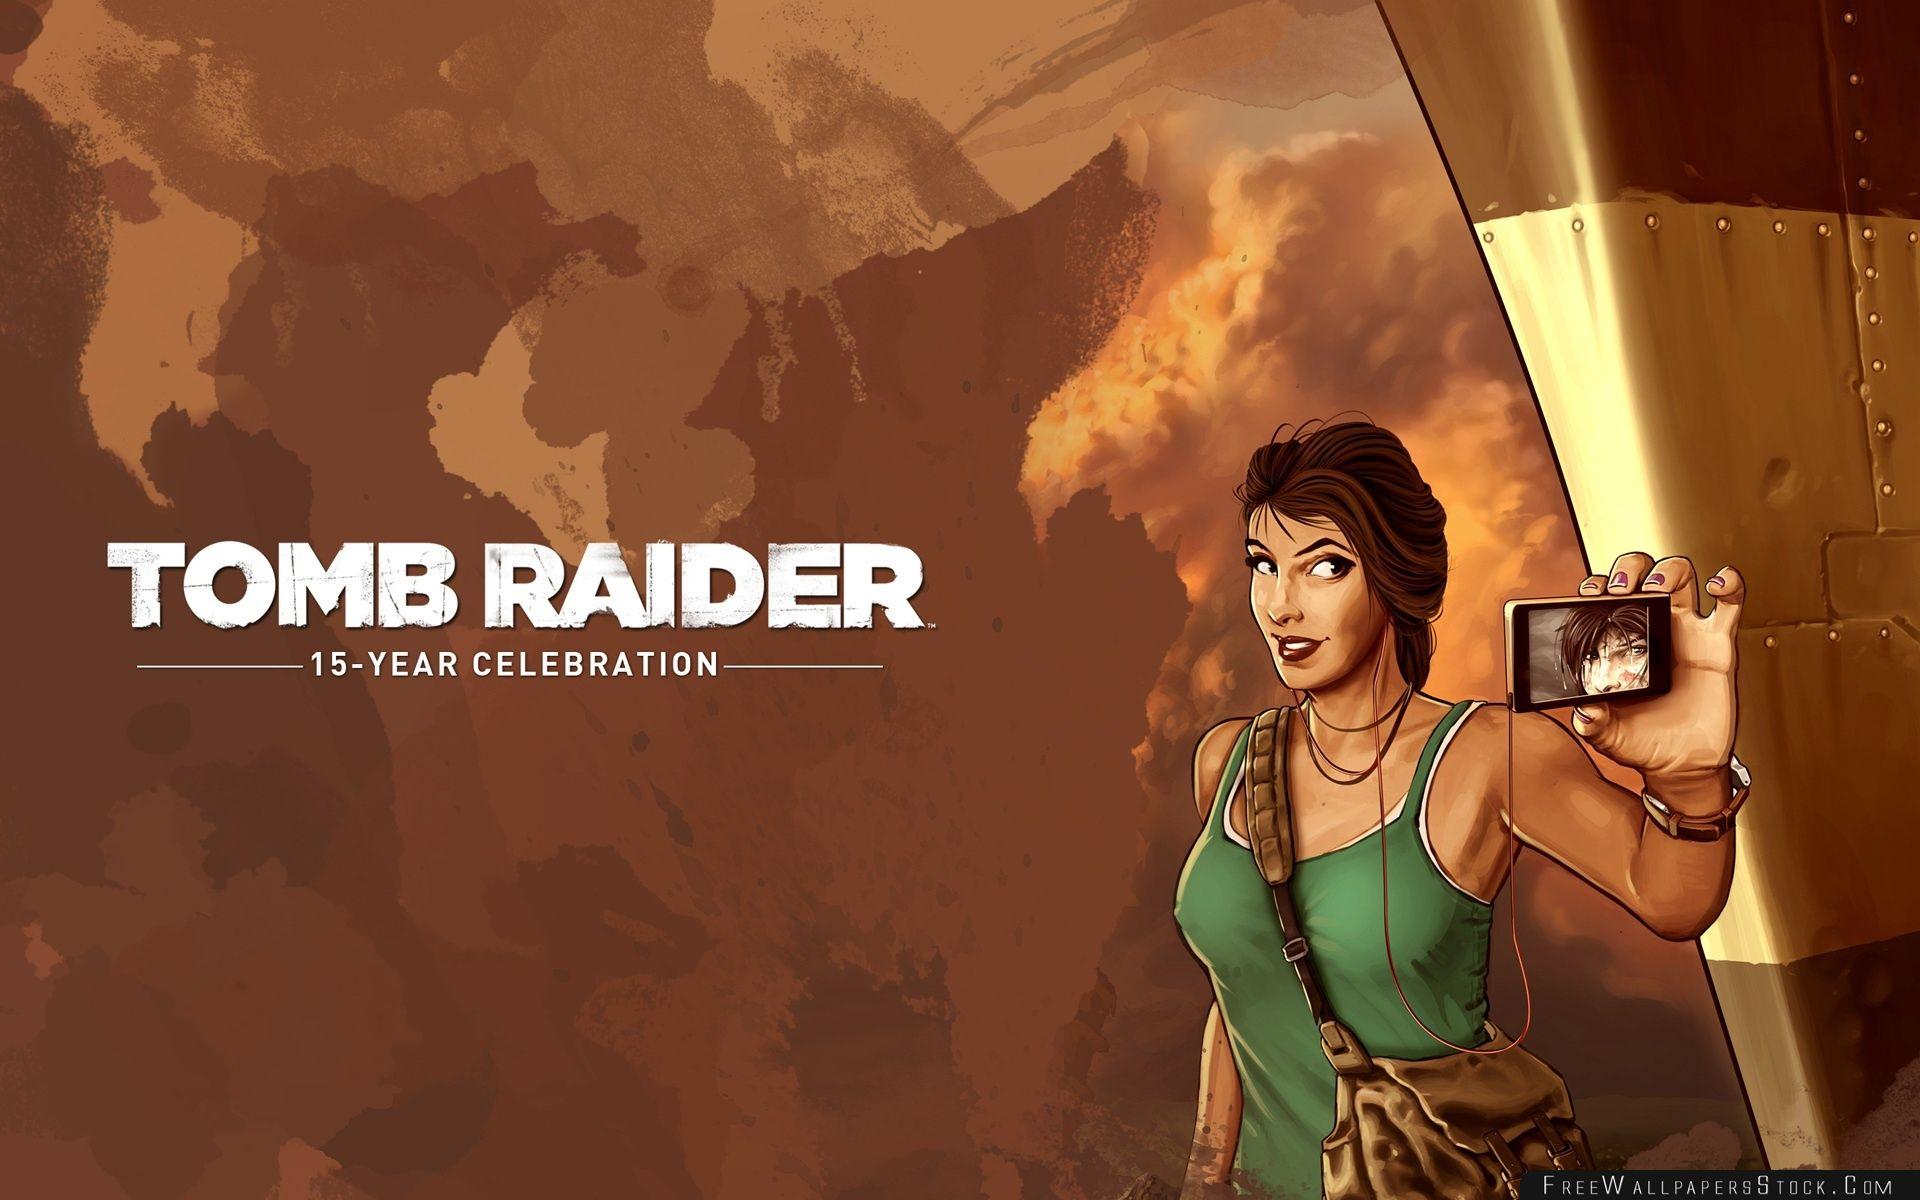 Download Free Wallpaper Tomb Raider Profile Pic